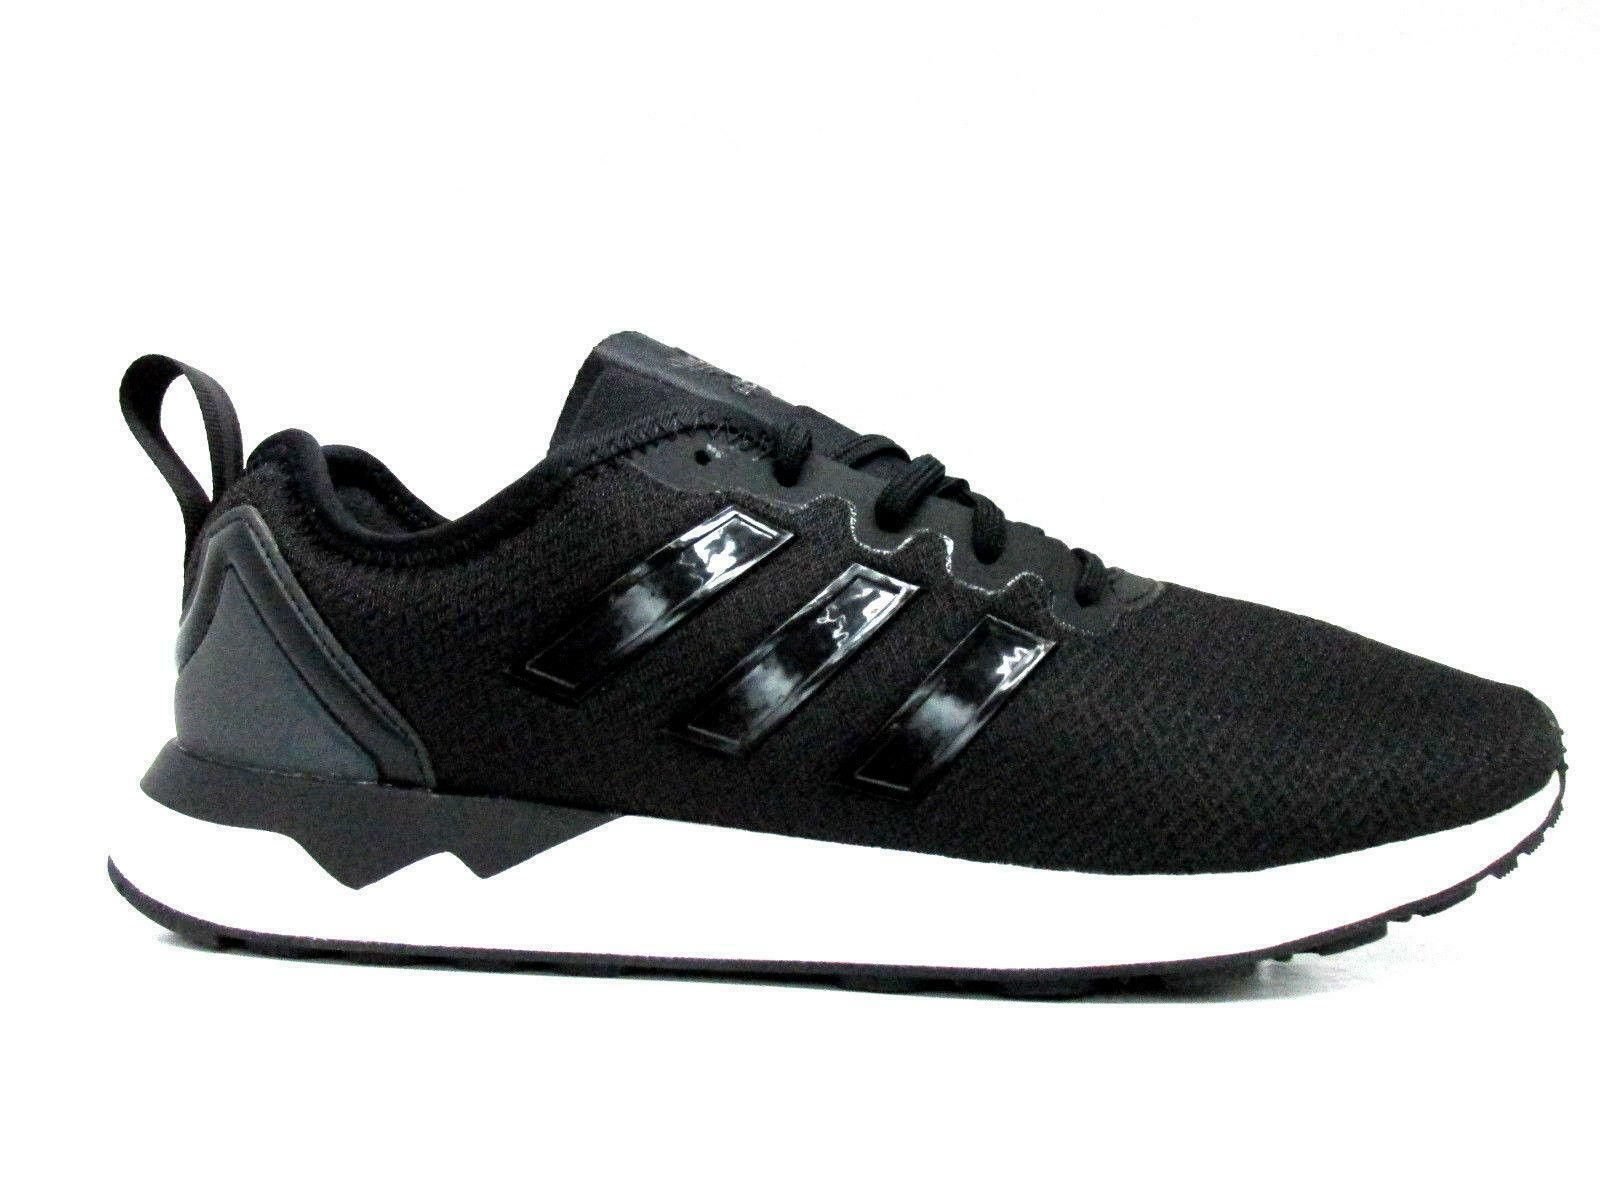 Hommes Adidas Zx Flux Adv Noir Blanc Basket Course Aq3350